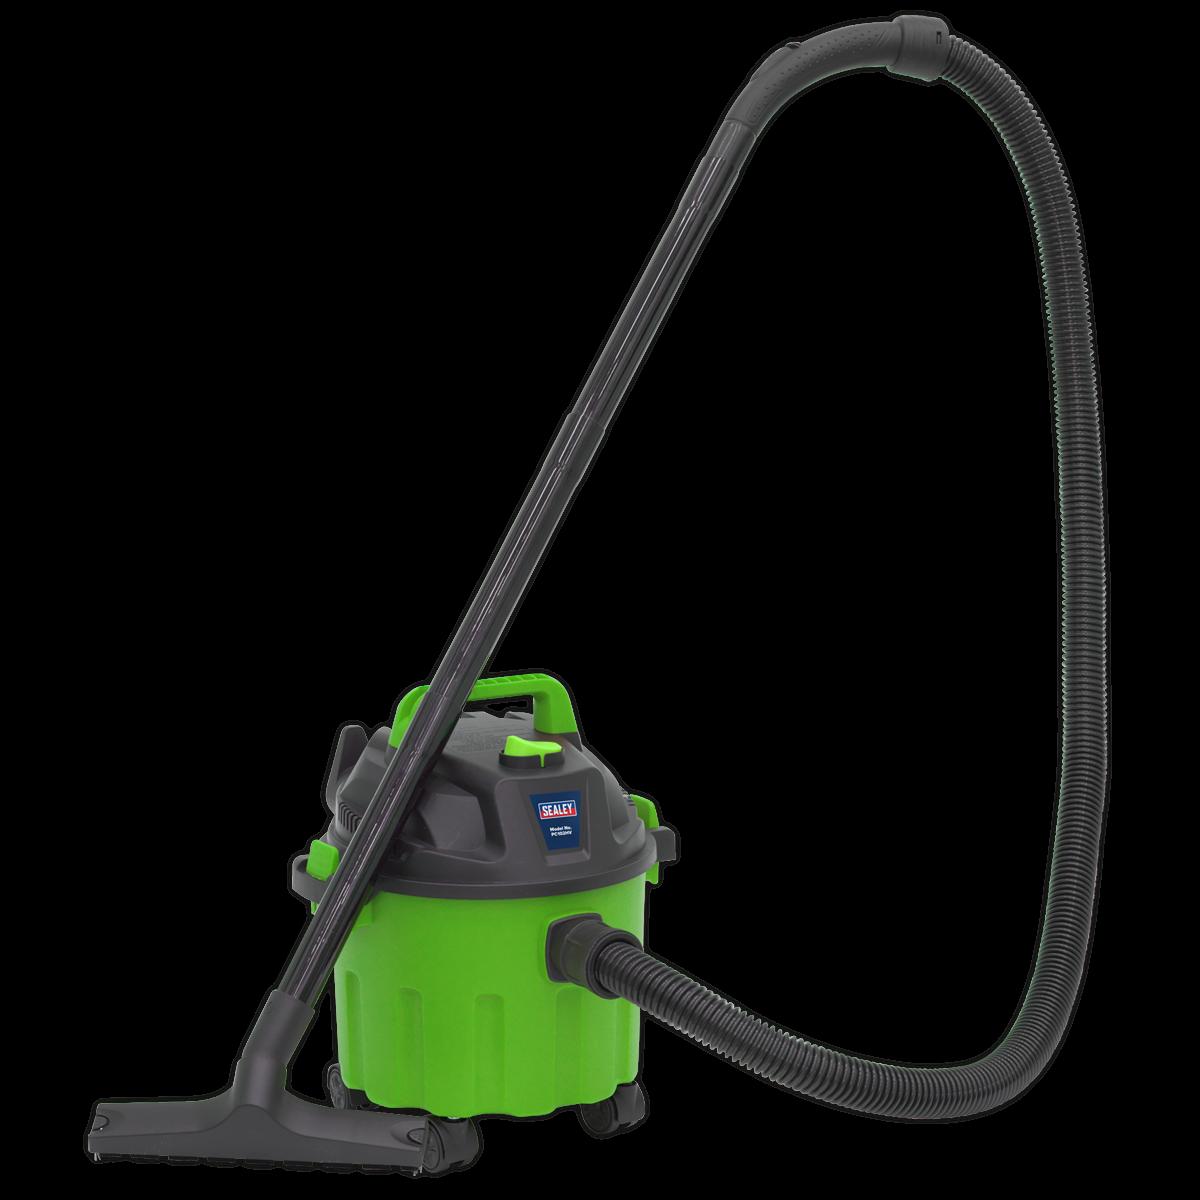 SEALEY VACUUM CLEANER WET/DRY 10L 1000W/230V - Hi-Vis Green